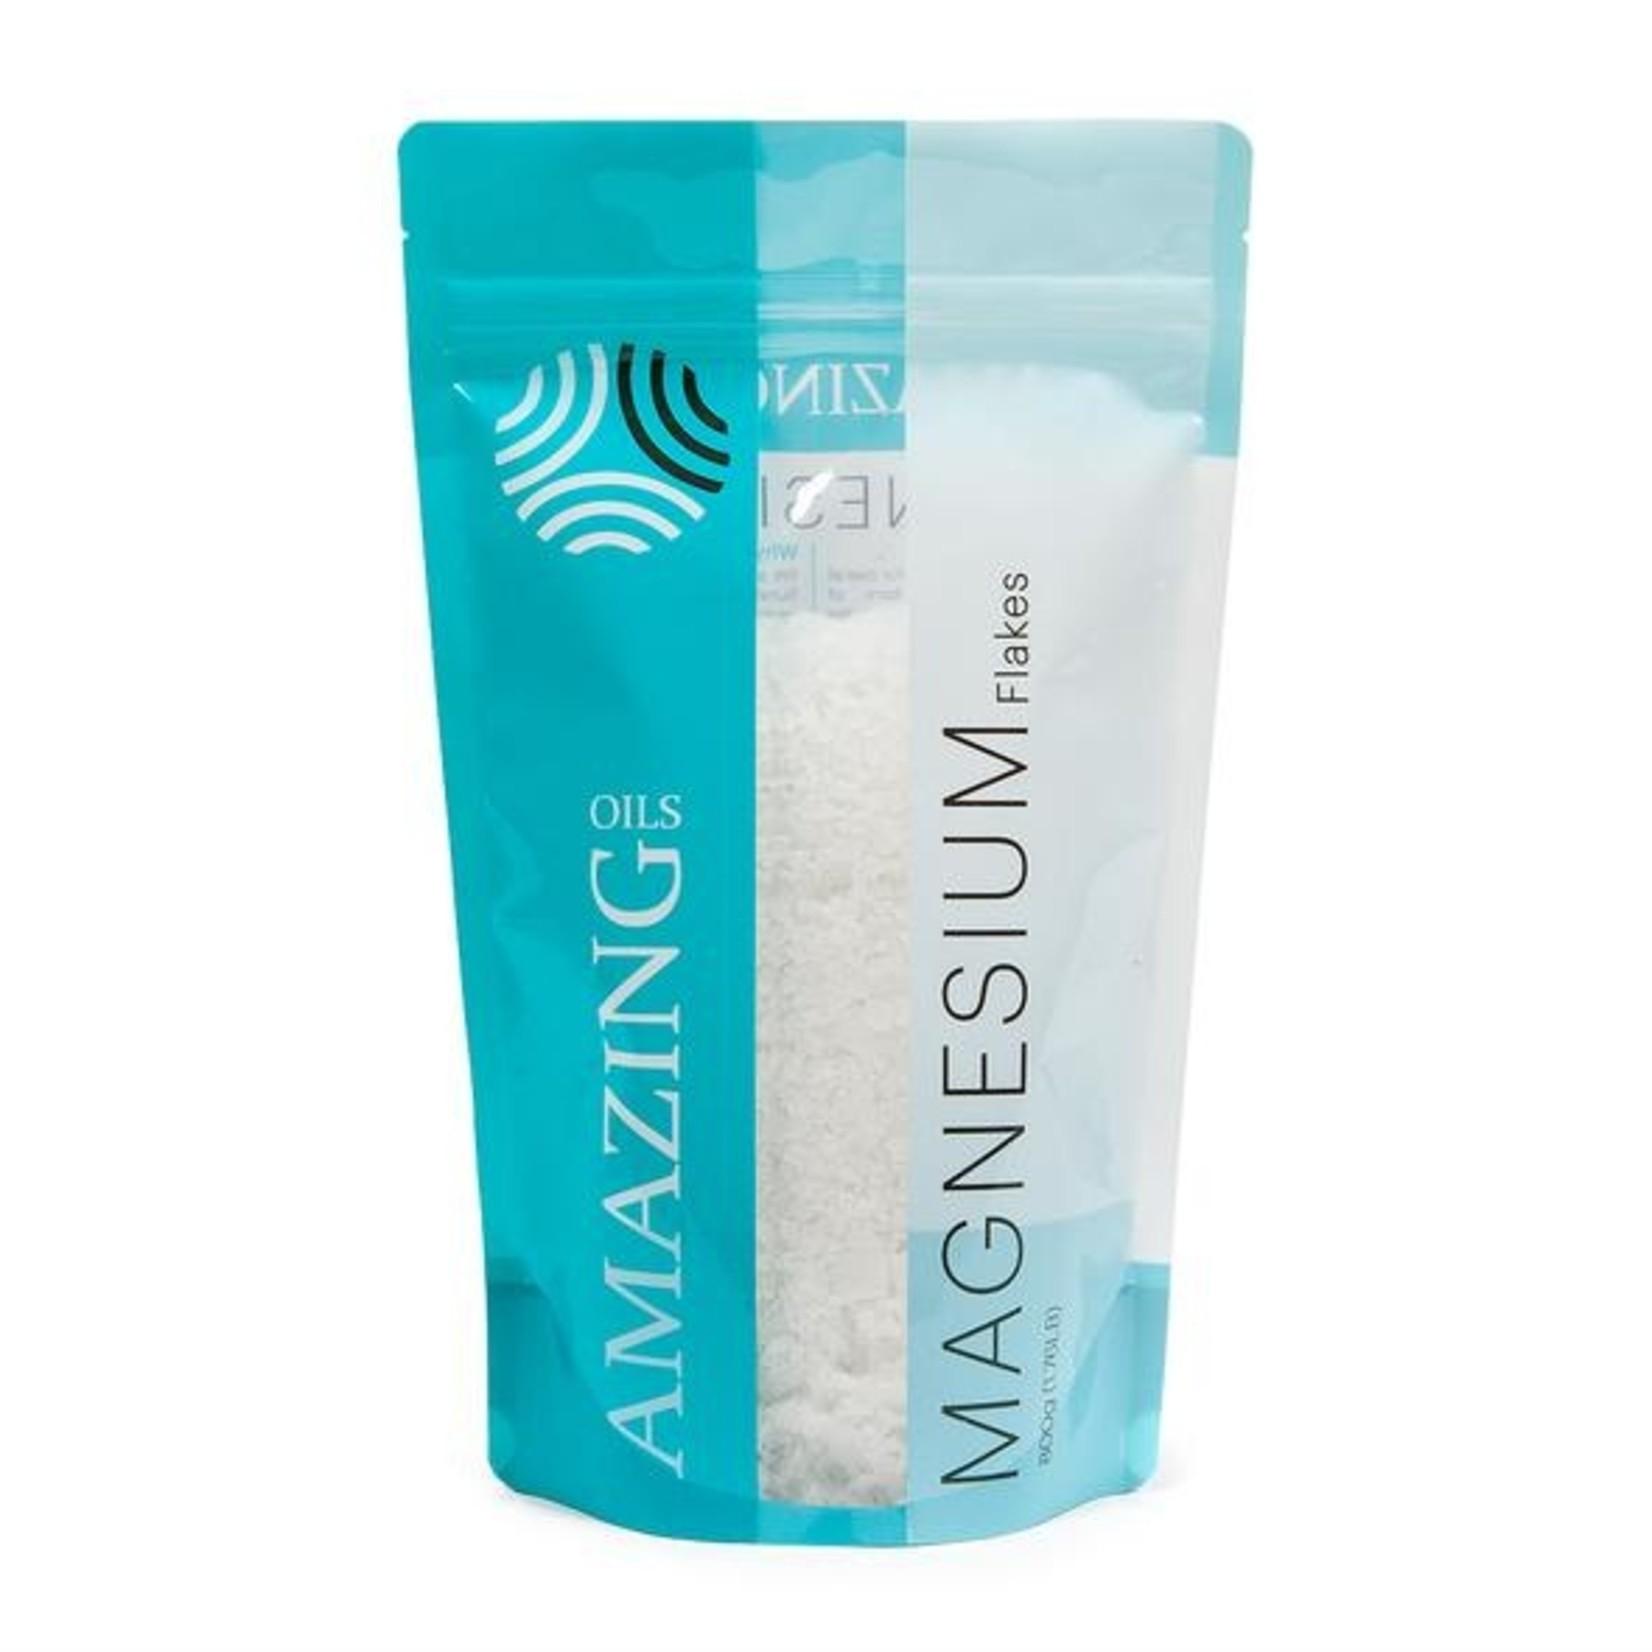 Magnesium bath flakes 200g